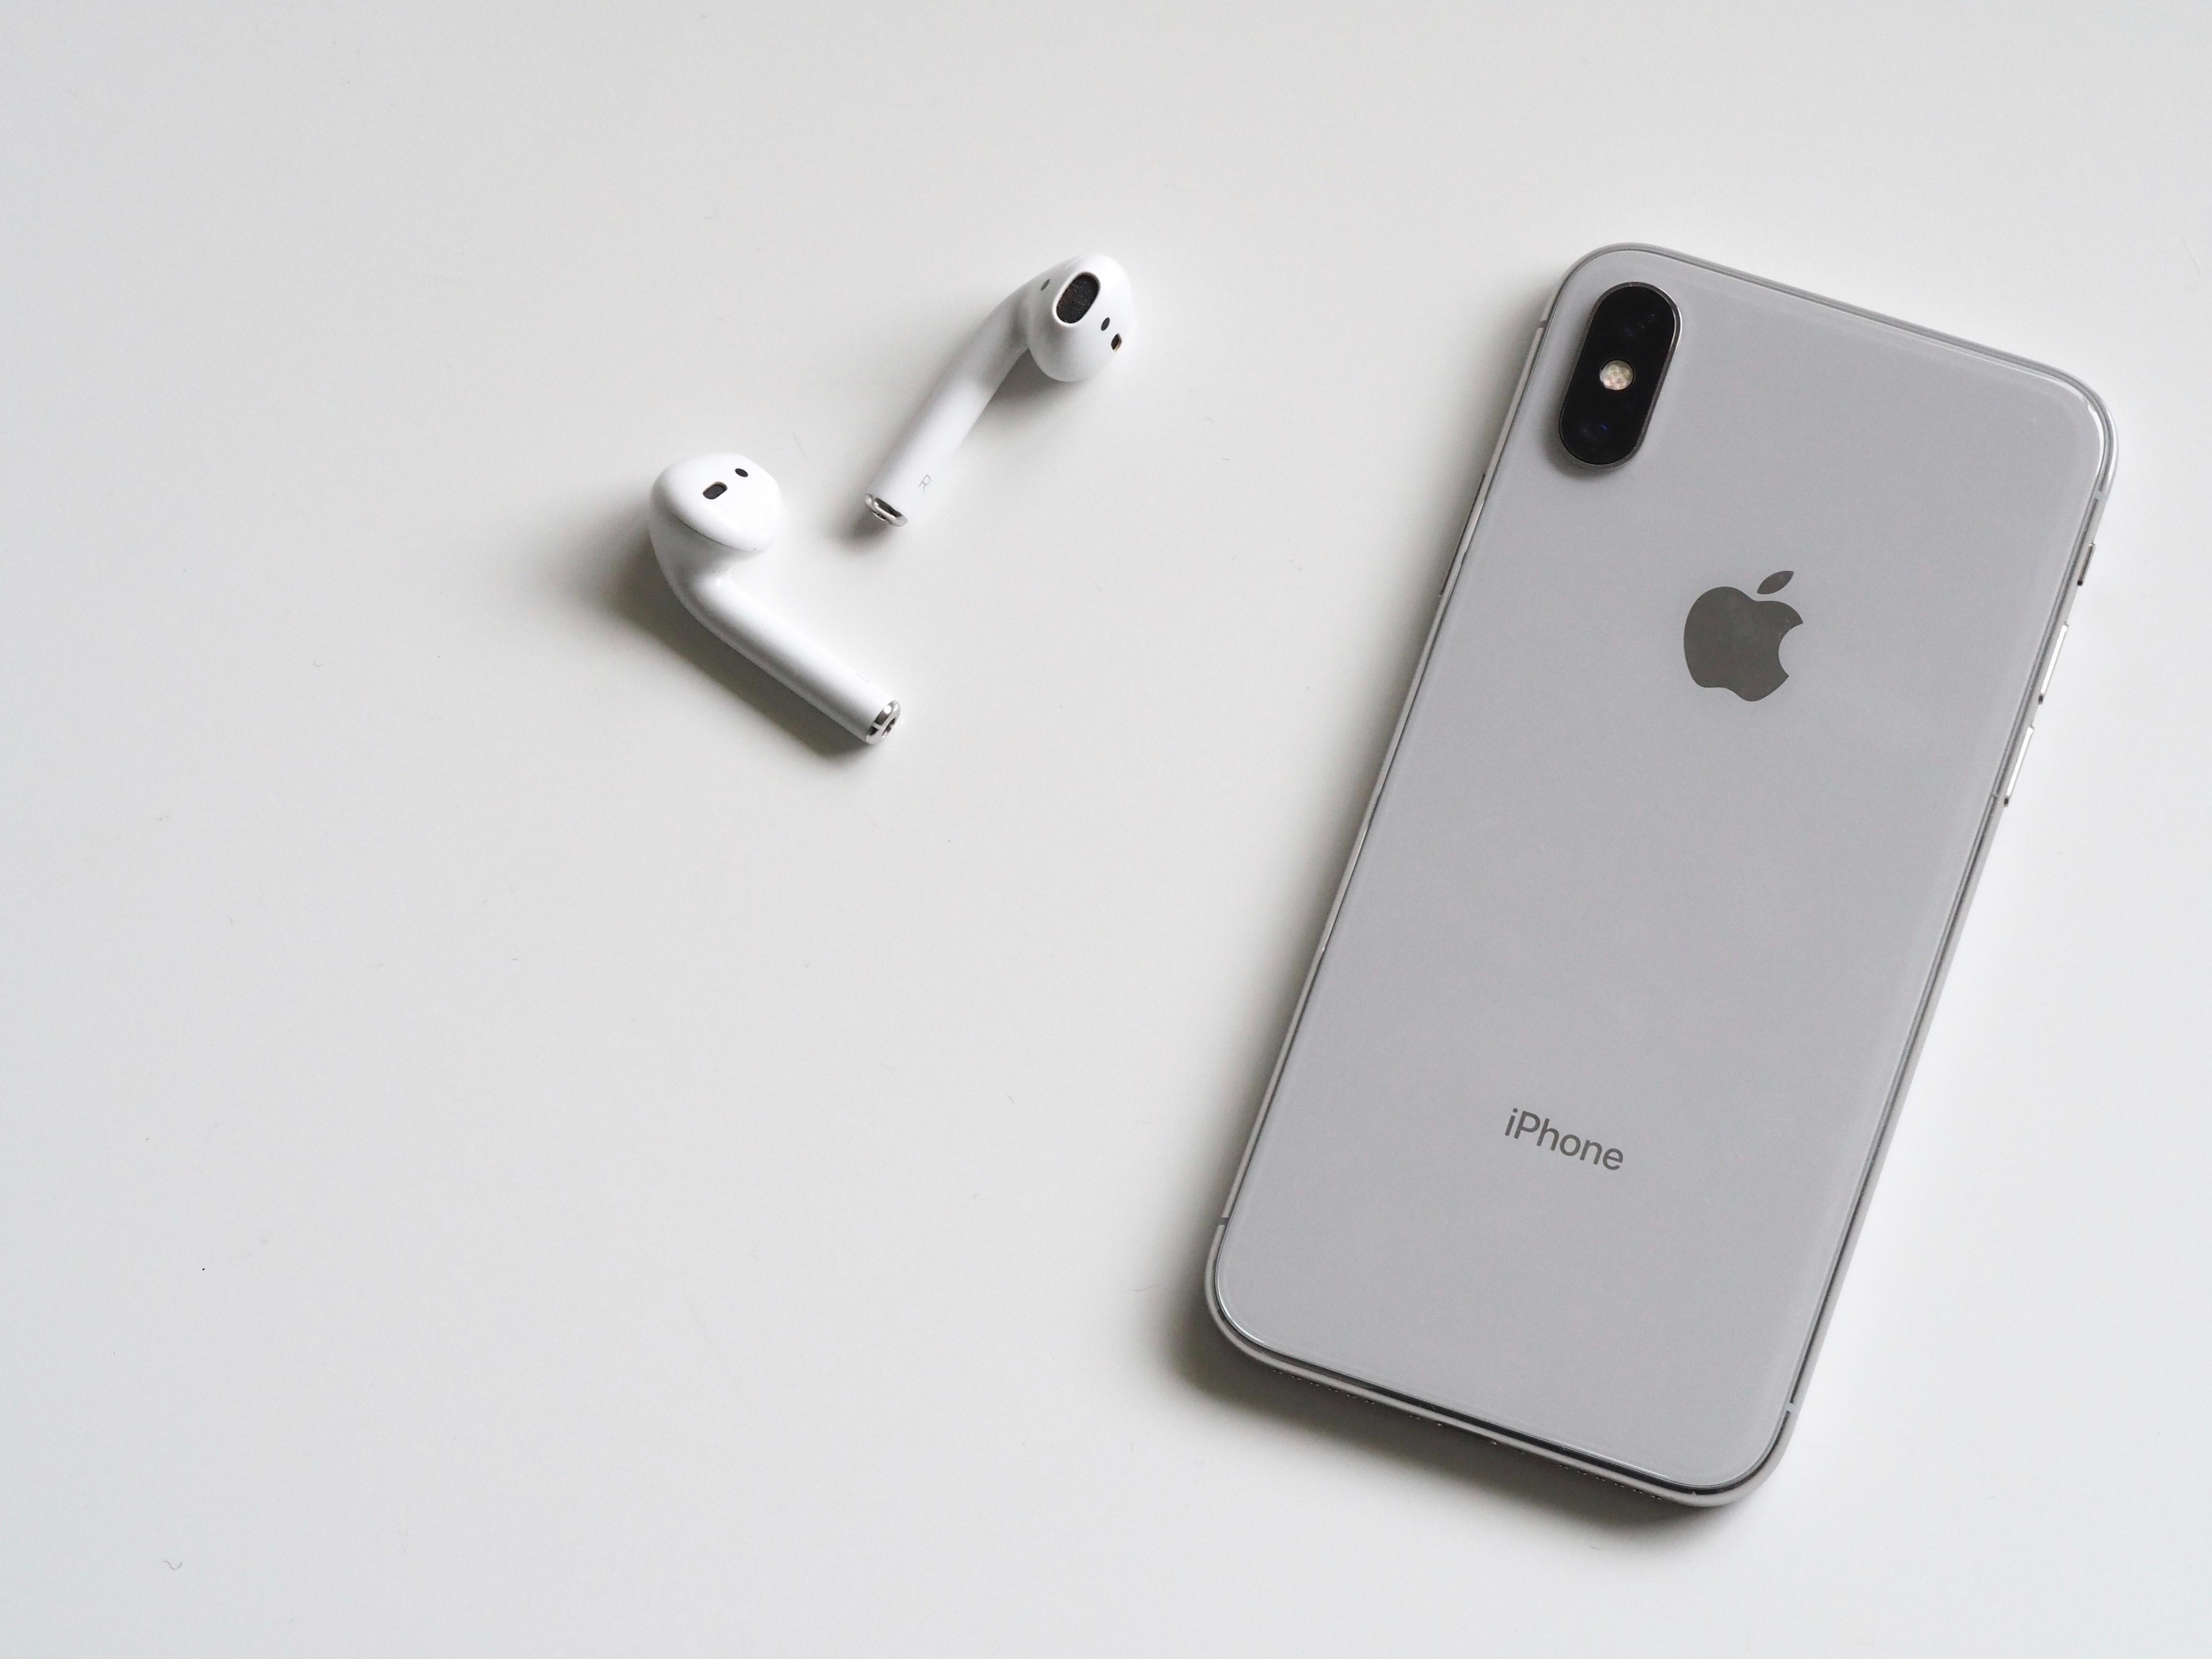 iPhone XR specs